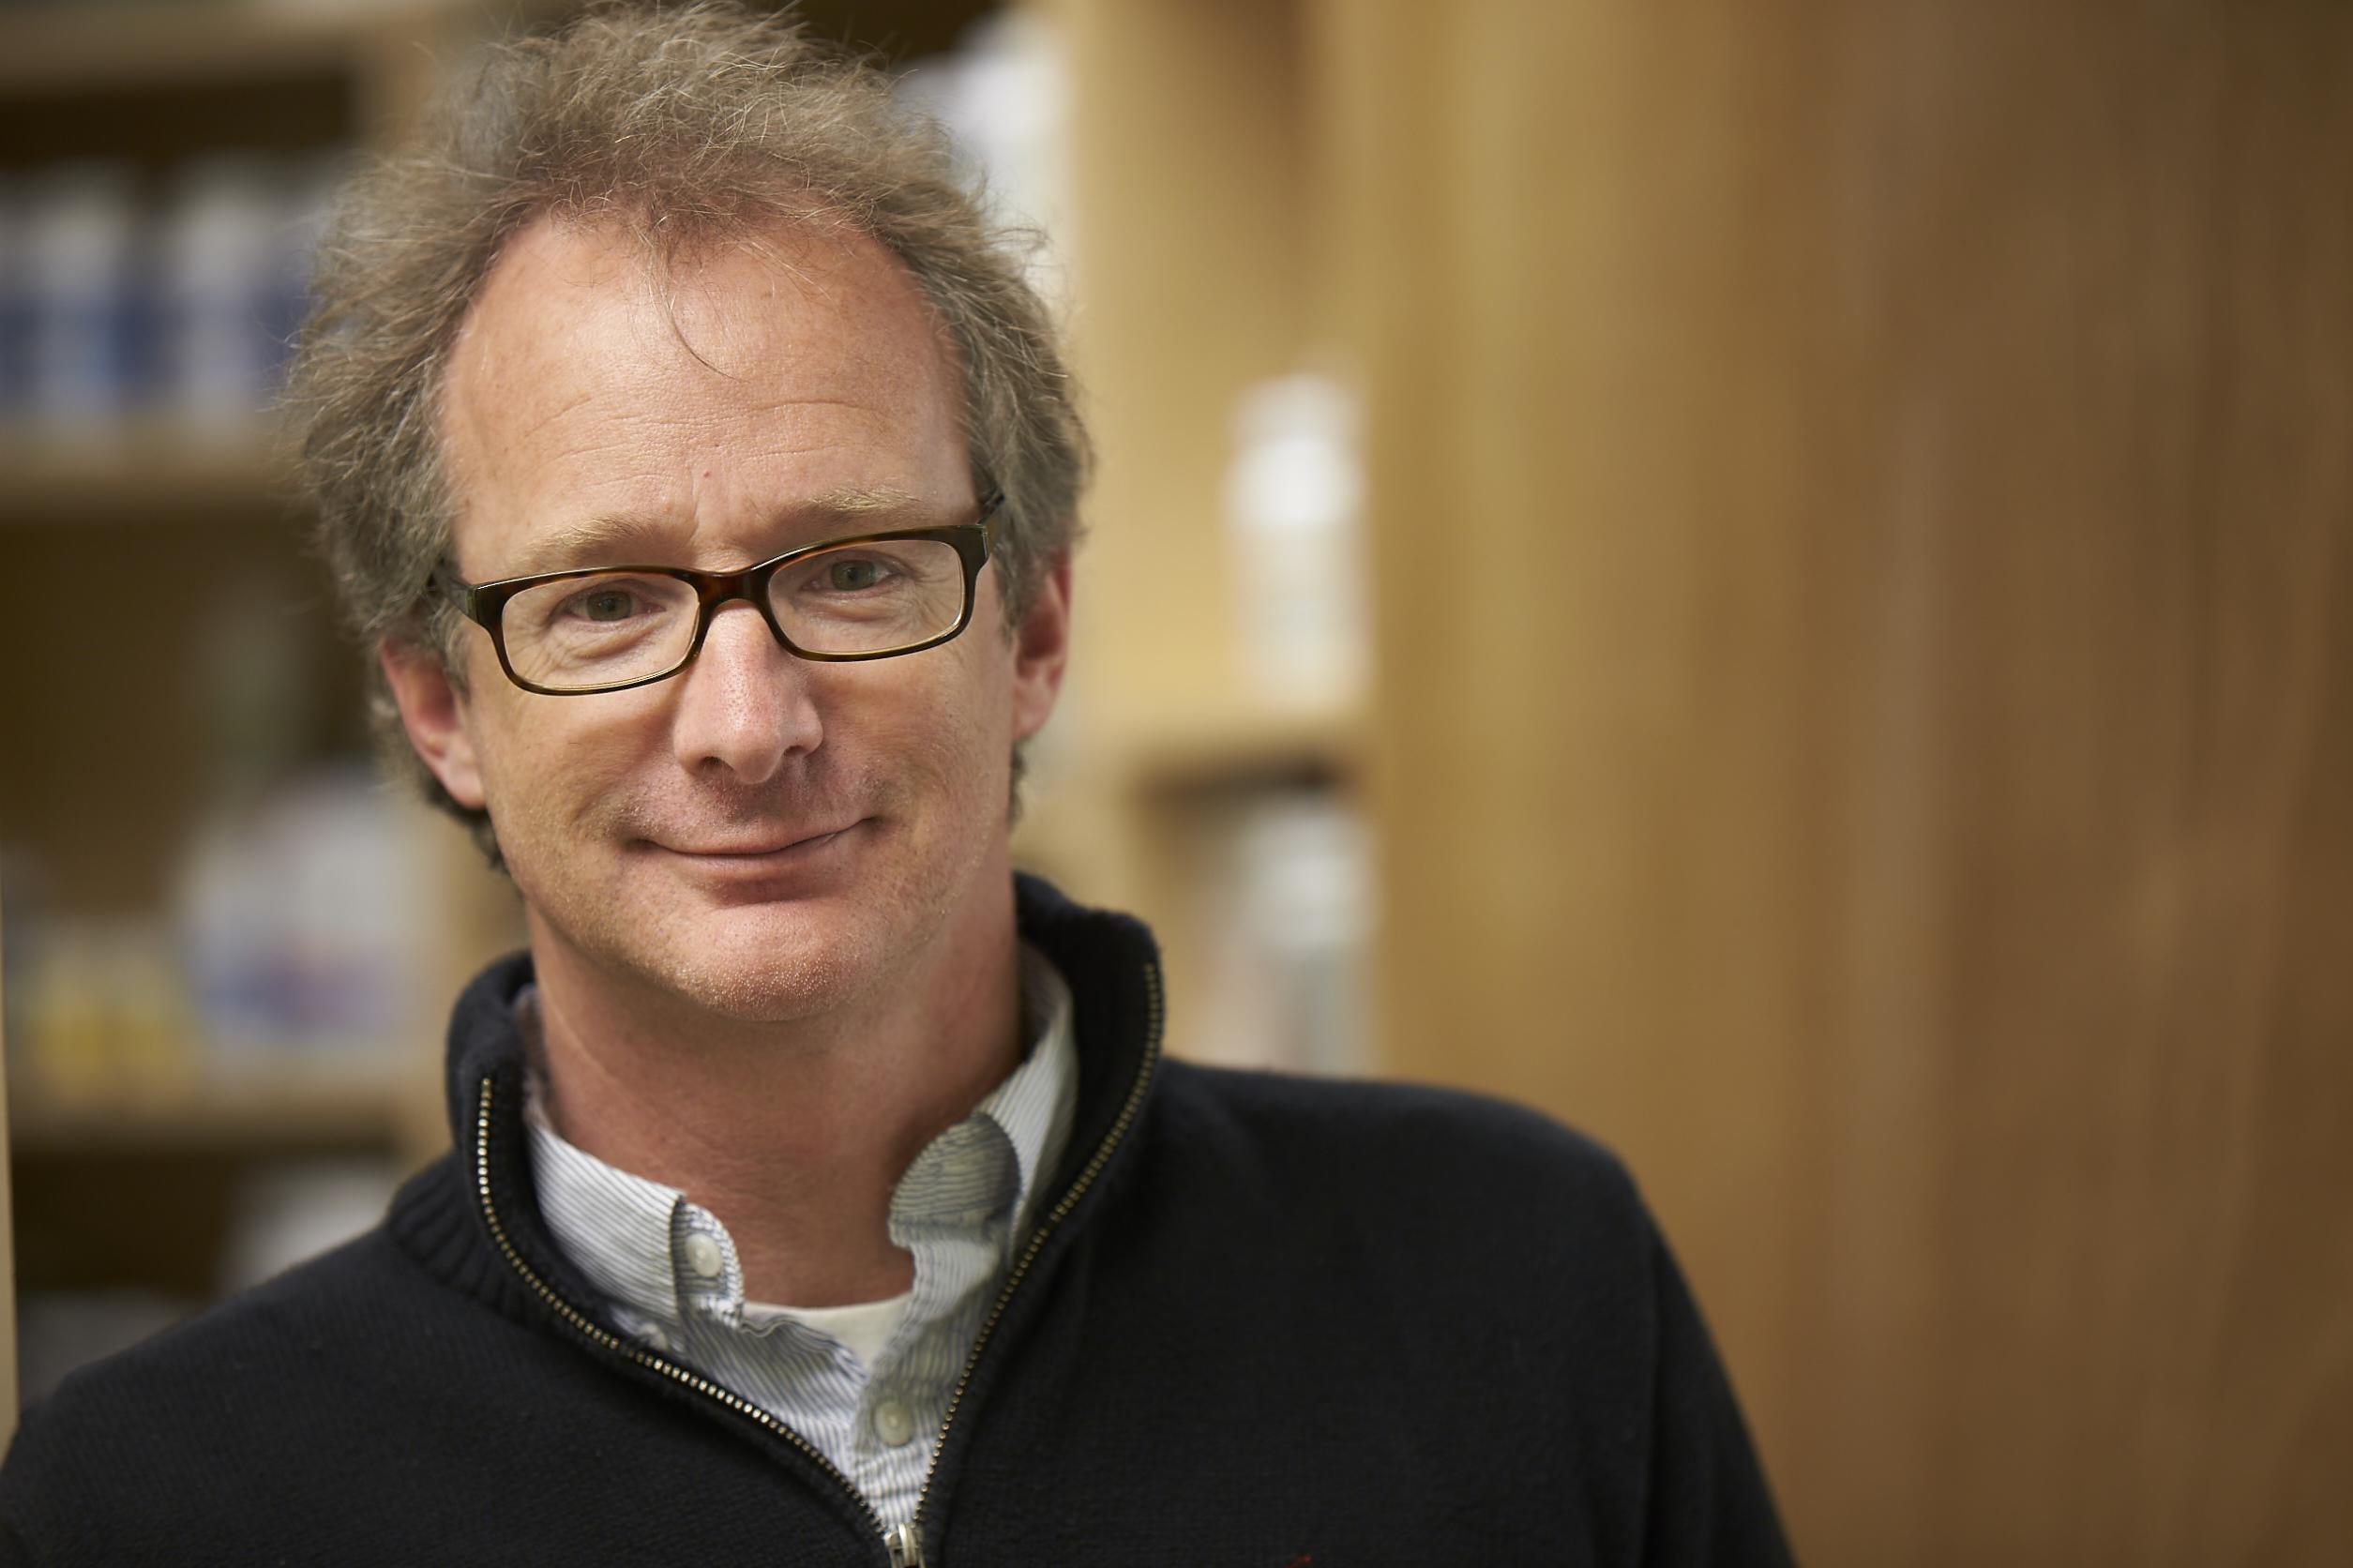 Mark Woodbury, marketing director at Biologic Healthcare